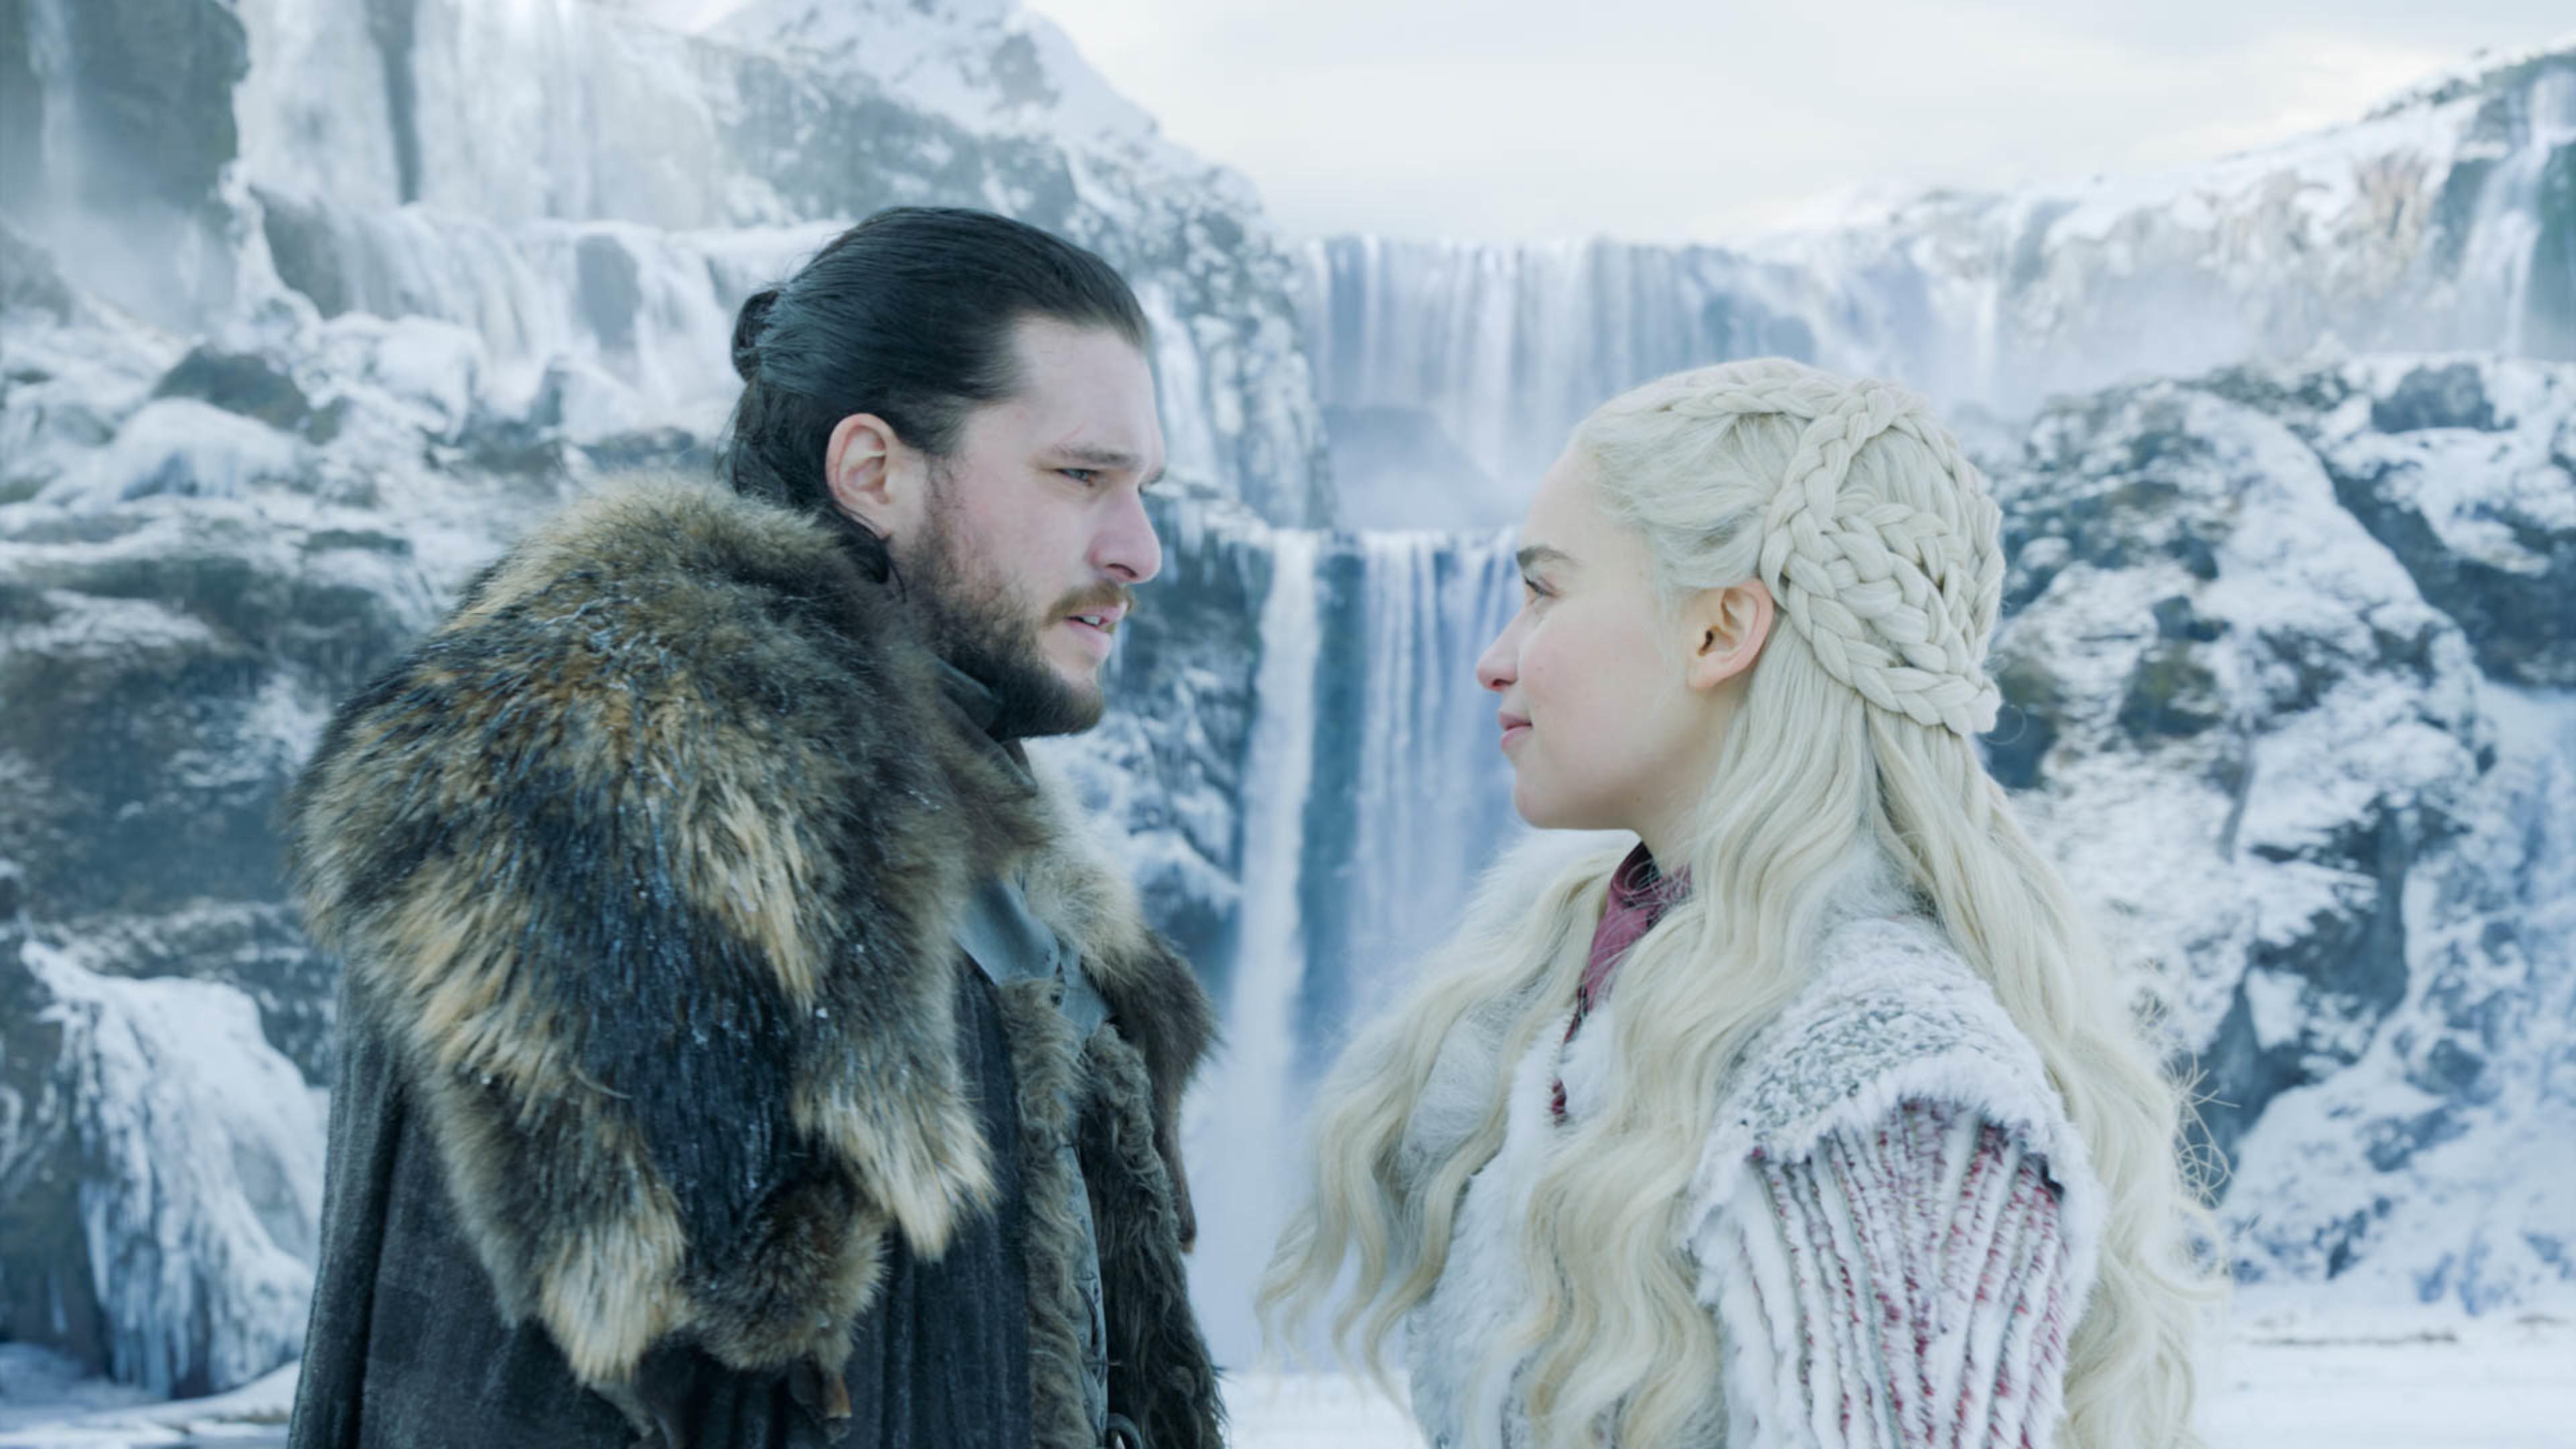 Jon Snow And Daenerys Targaryen Game Of Thrones Season 8 4k